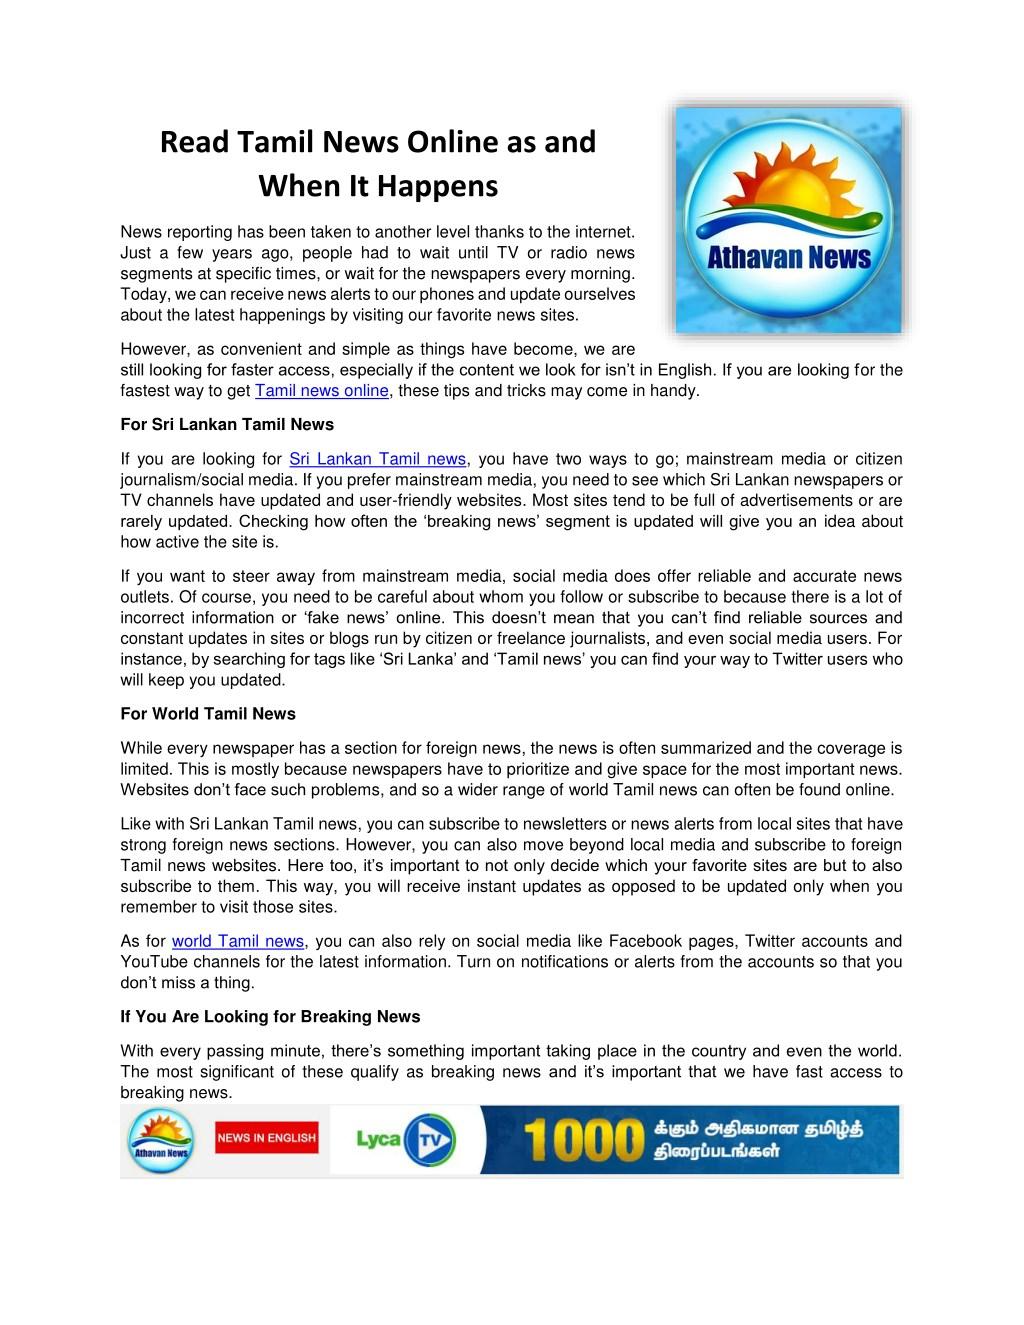 PPT - Sri Lanka Tamil News | World Tamil News | Athavan News